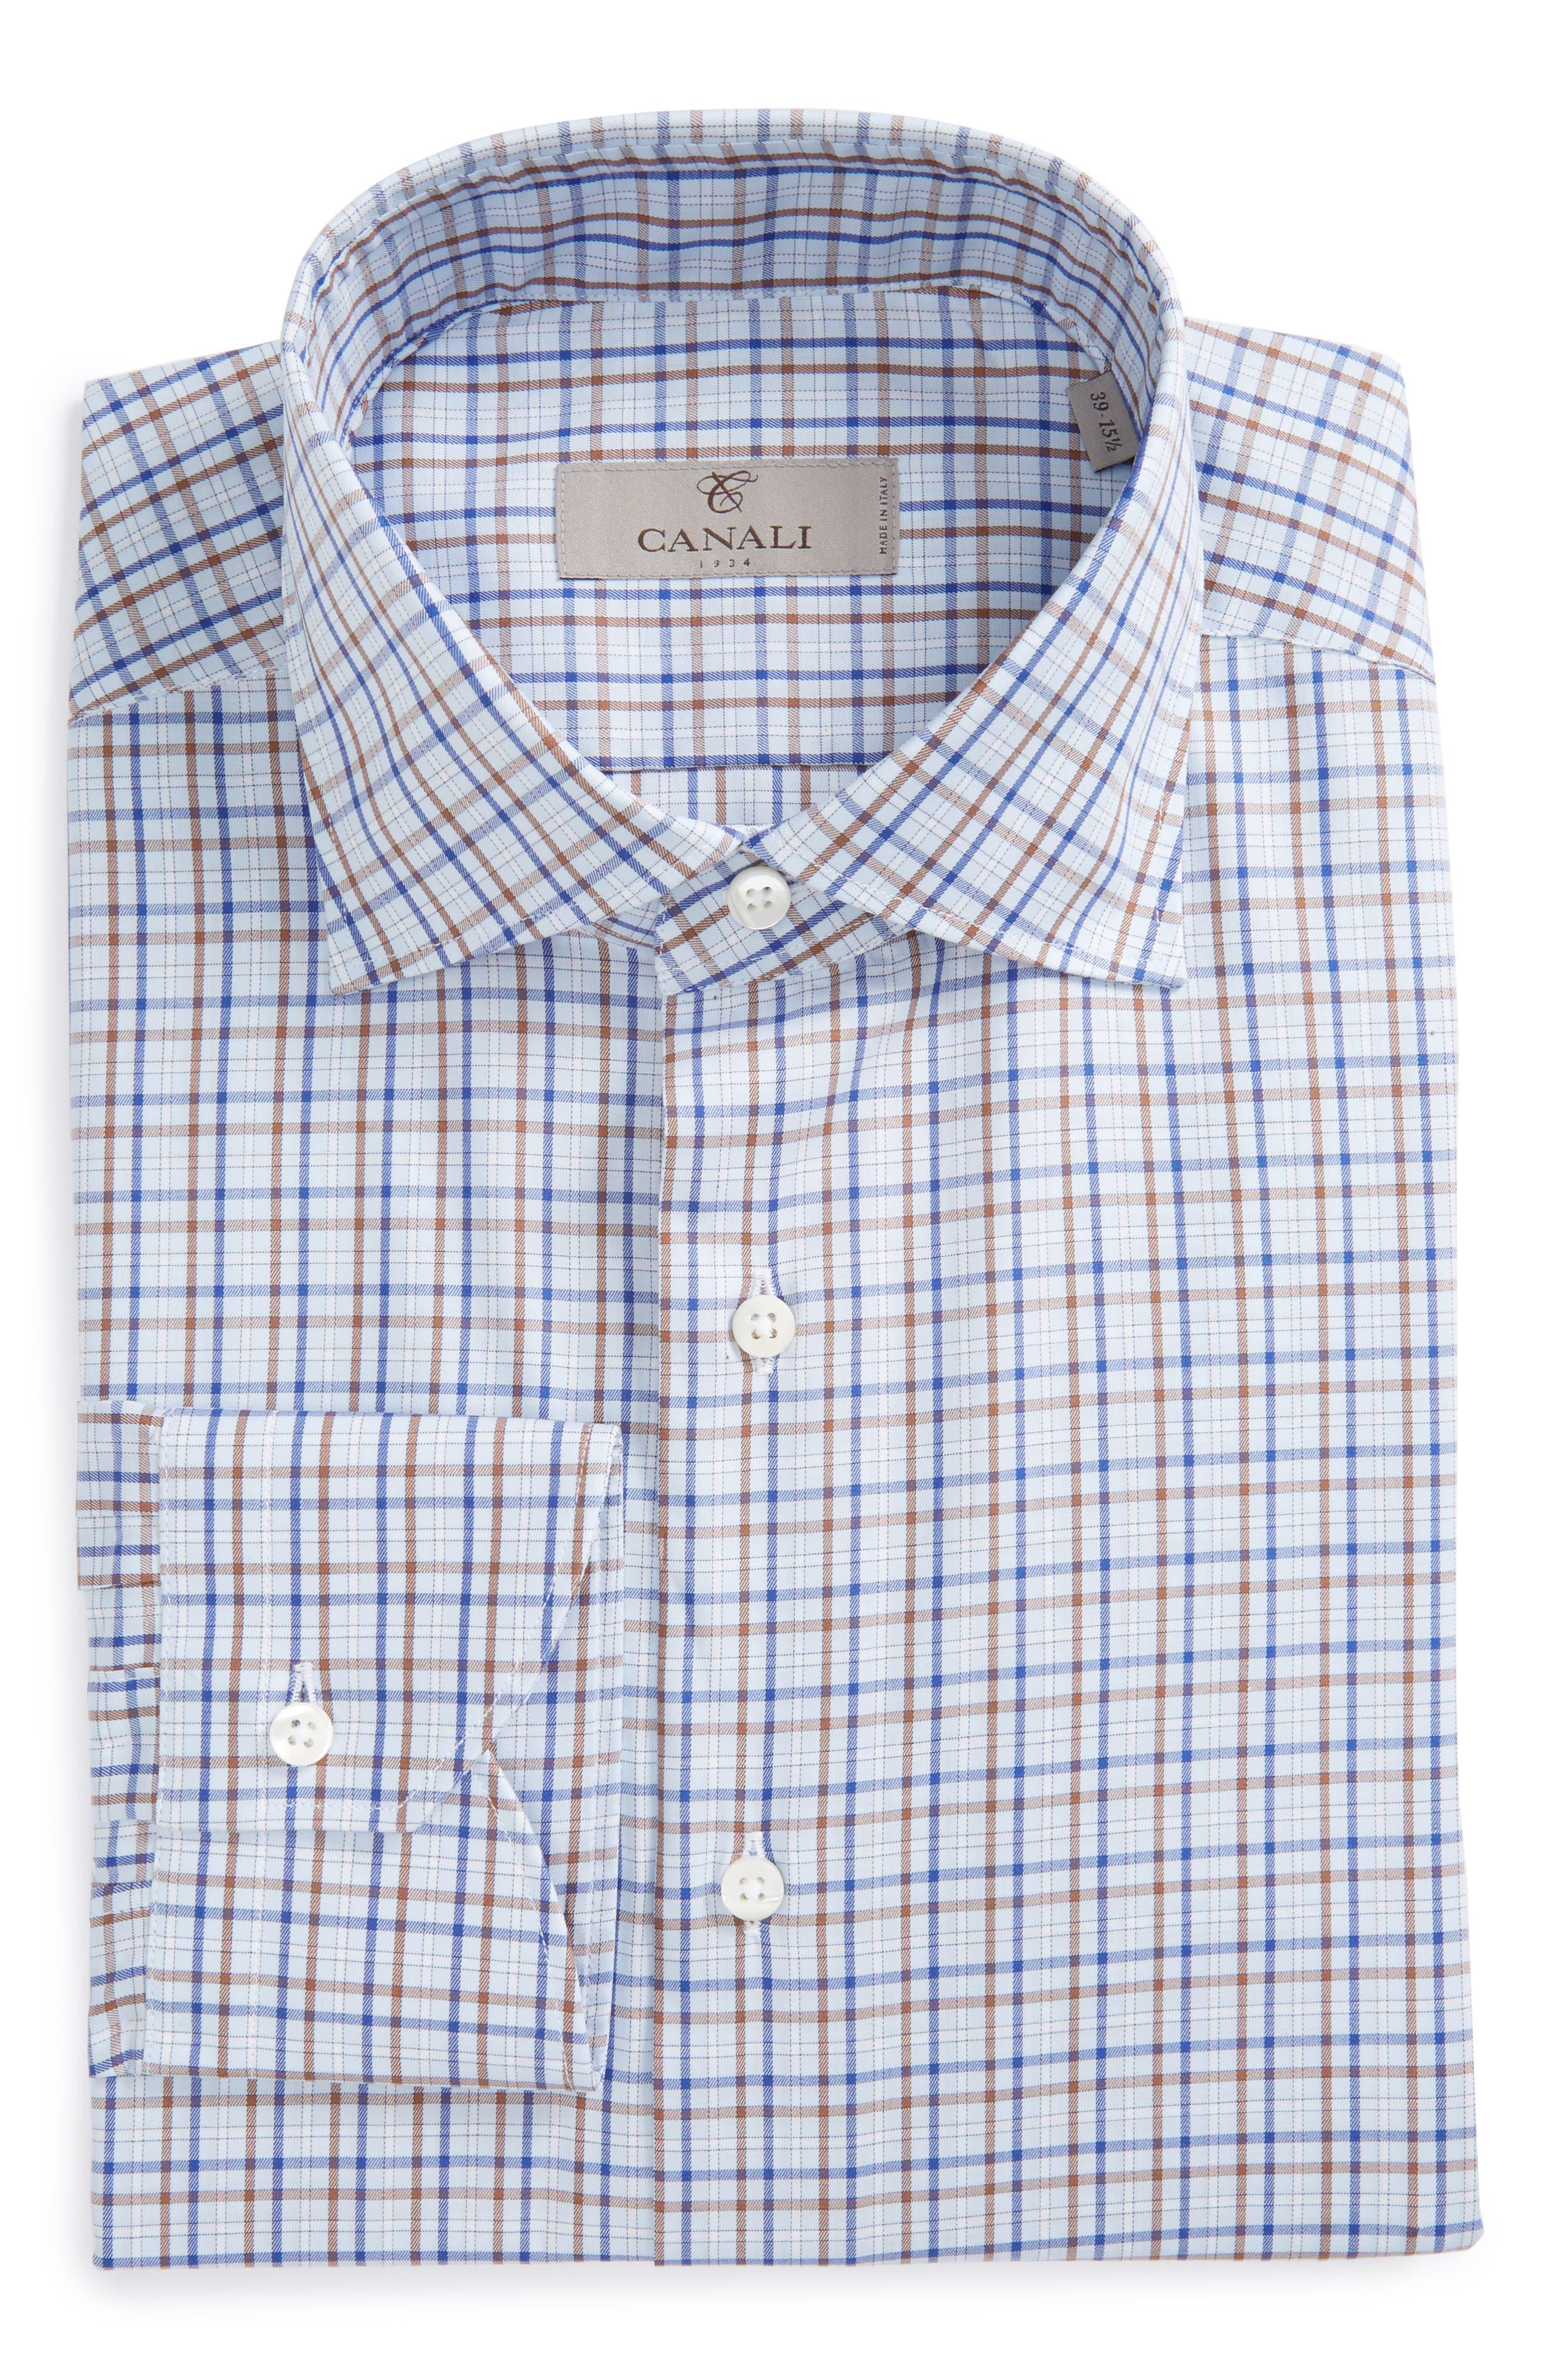 Regular Fit Check Dress Shirt,                         Main,                         color, Blue/ Brown Check